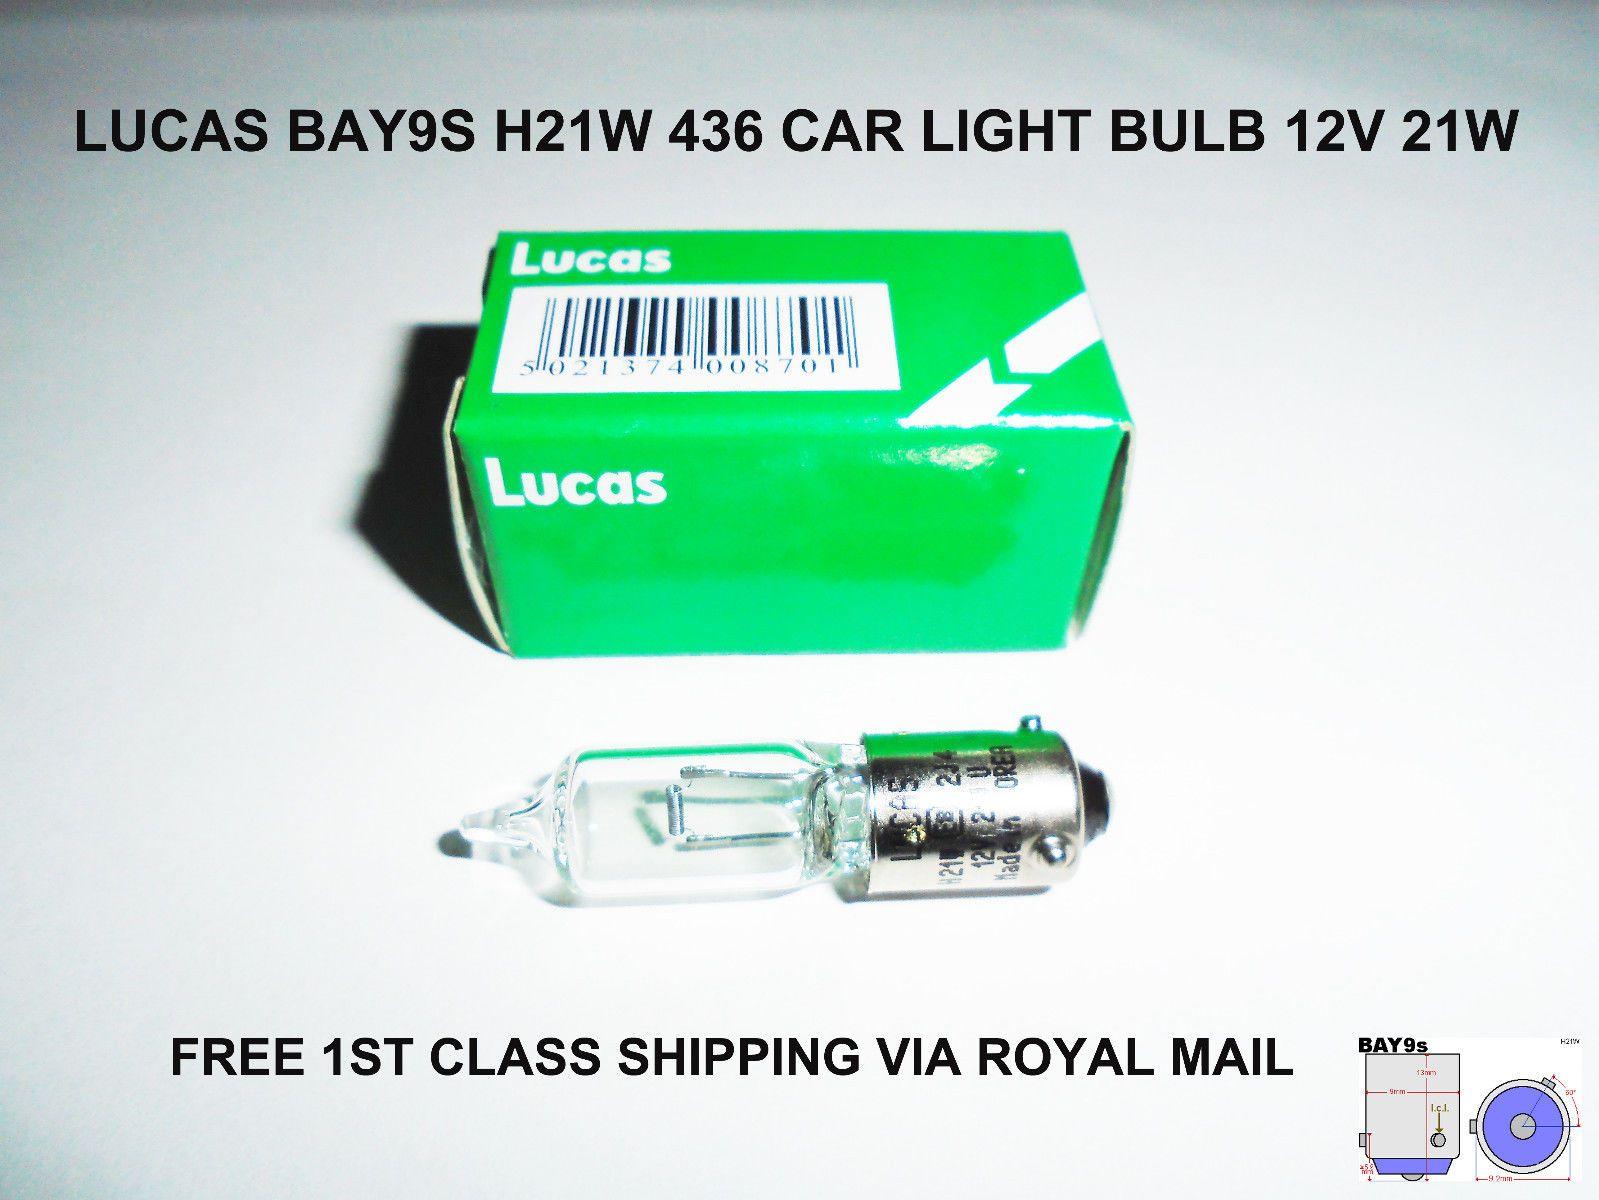 LUCAS LLB582 12V 21W WY21W CAPLESS W3x16D LIGHT BULB